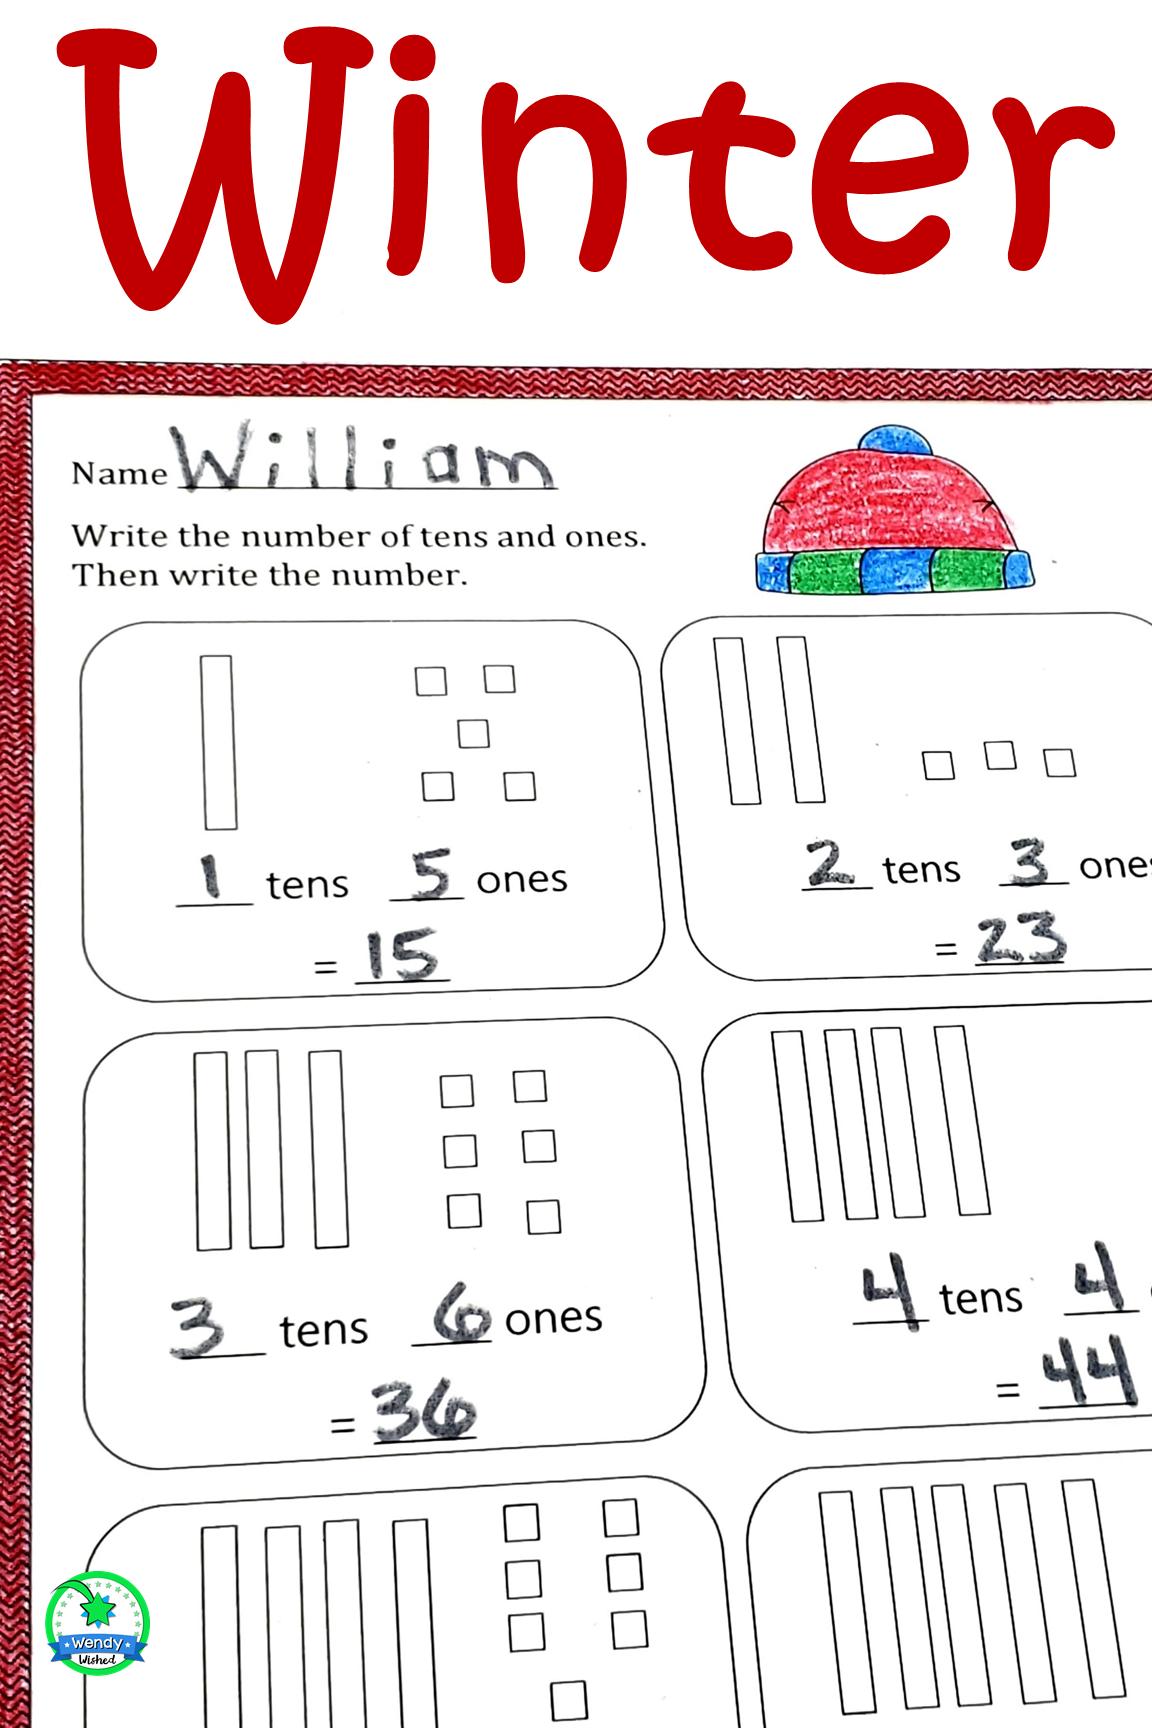 Winter Math Worksheets For 1st Grade Winter Math Worksheets Math Worksheets First Grade Math Worksheets [ 1728 x 1152 Pixel ]